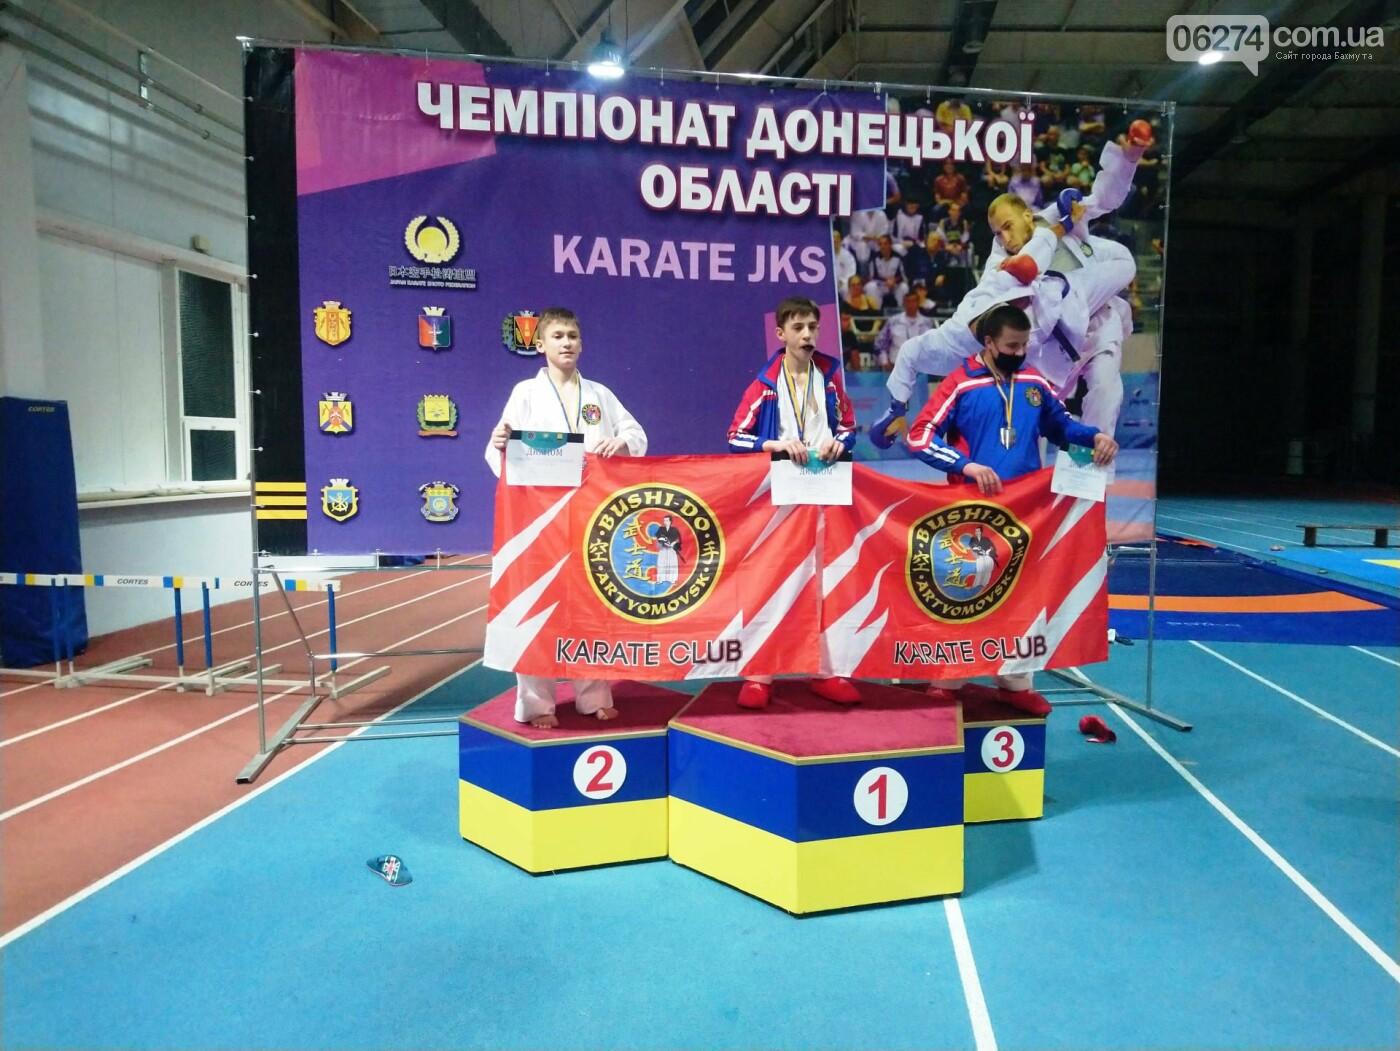 Бахмут гостеприимно принимал чемпионат Донецкой области по каратэ, фото-1